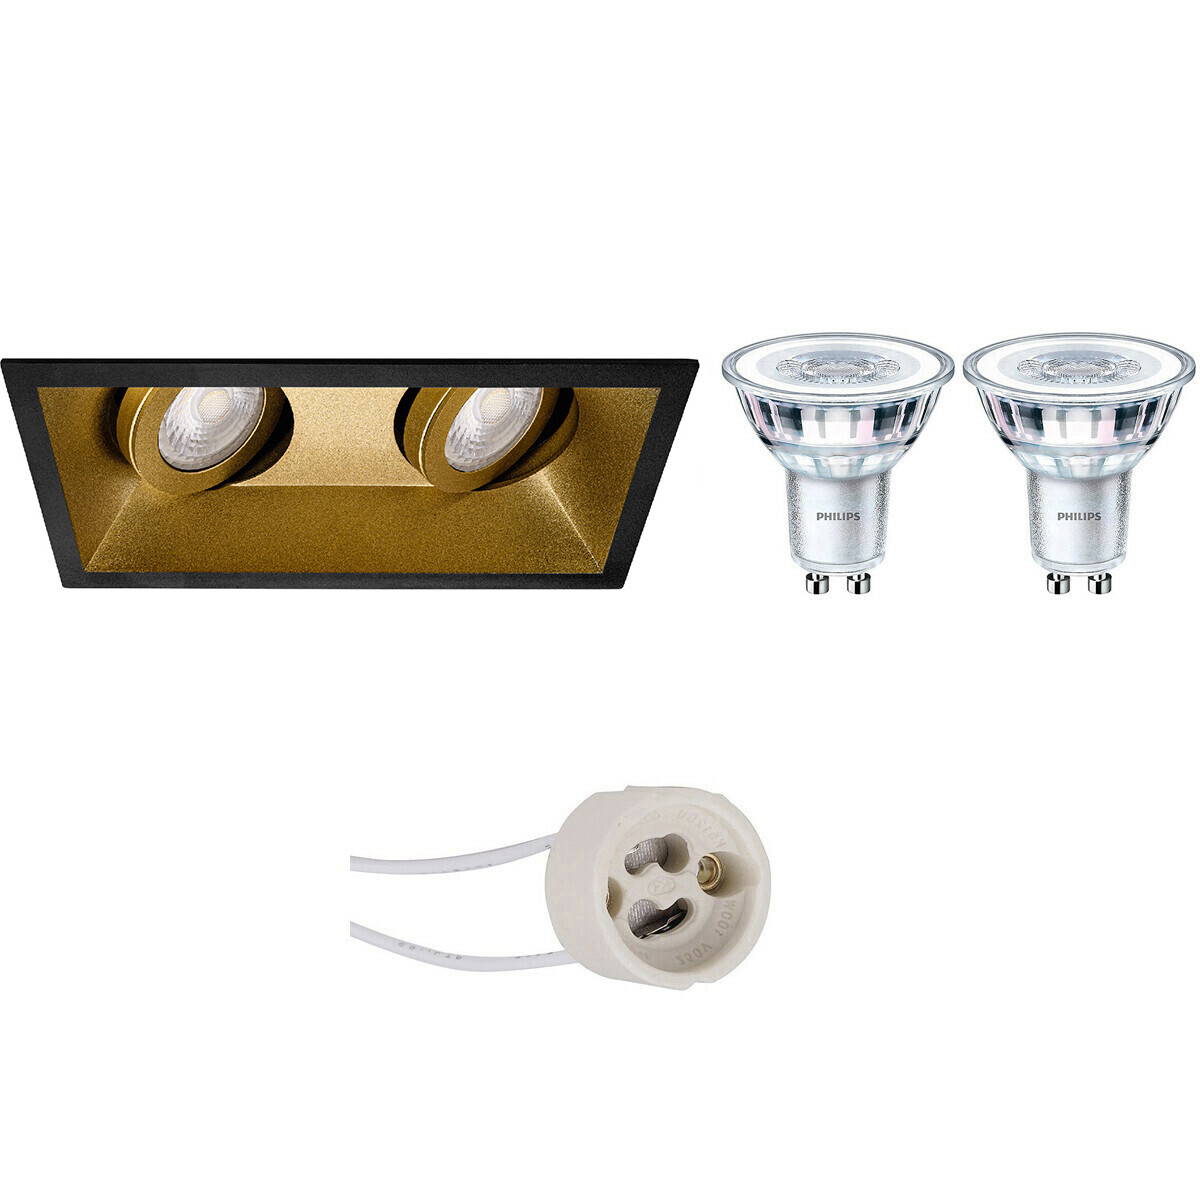 PHILIPS - LED Spot Set - CorePro 827 36D - Pragmi Zano Pro - GU10 Fitting - Dimbaar - Inbouw Rechtho